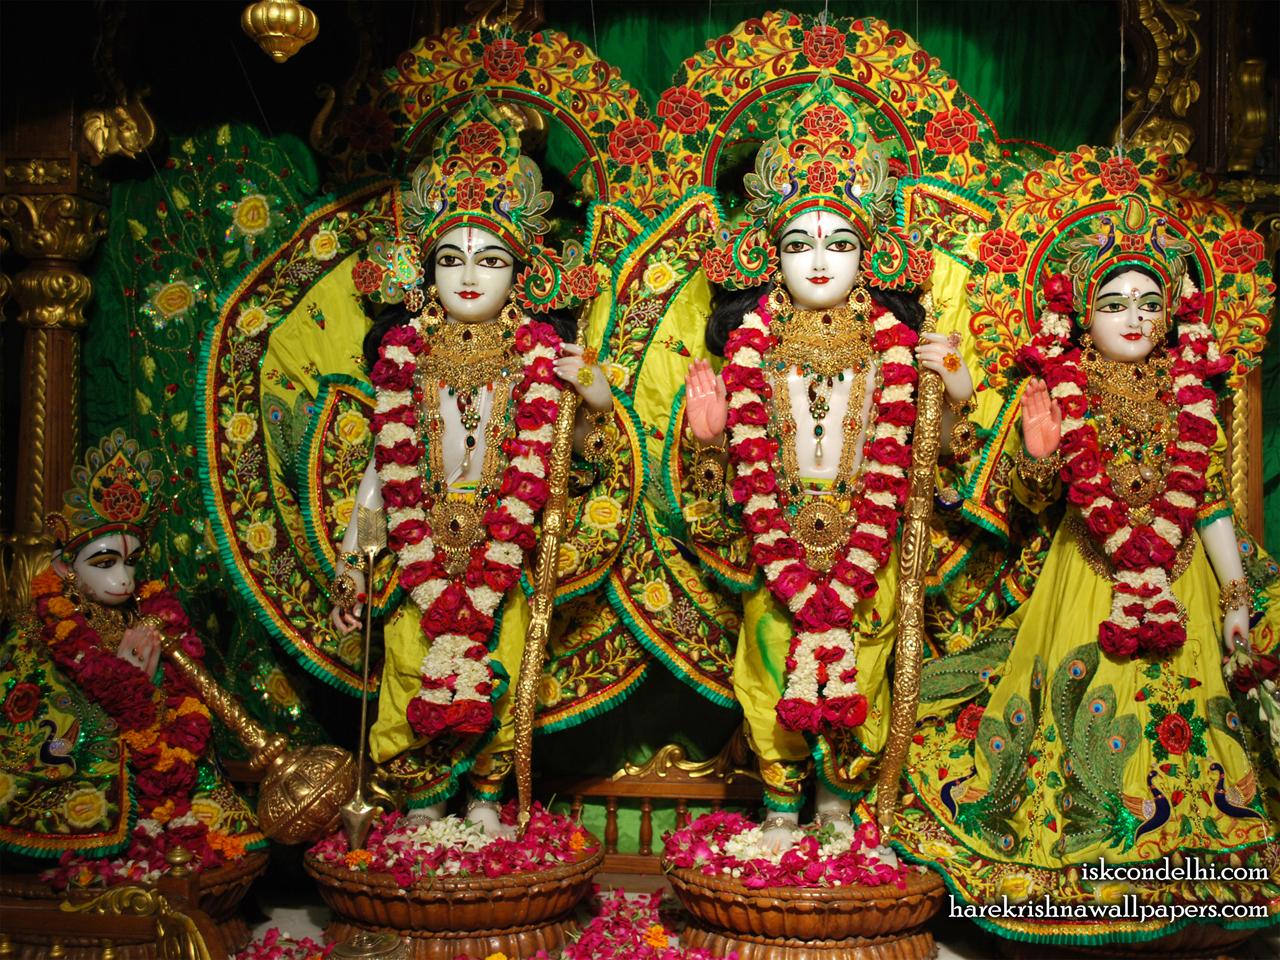 Sri Sri Sita Rama Laxman Hanuman Wallpaper (012) Size 1280x960 Download